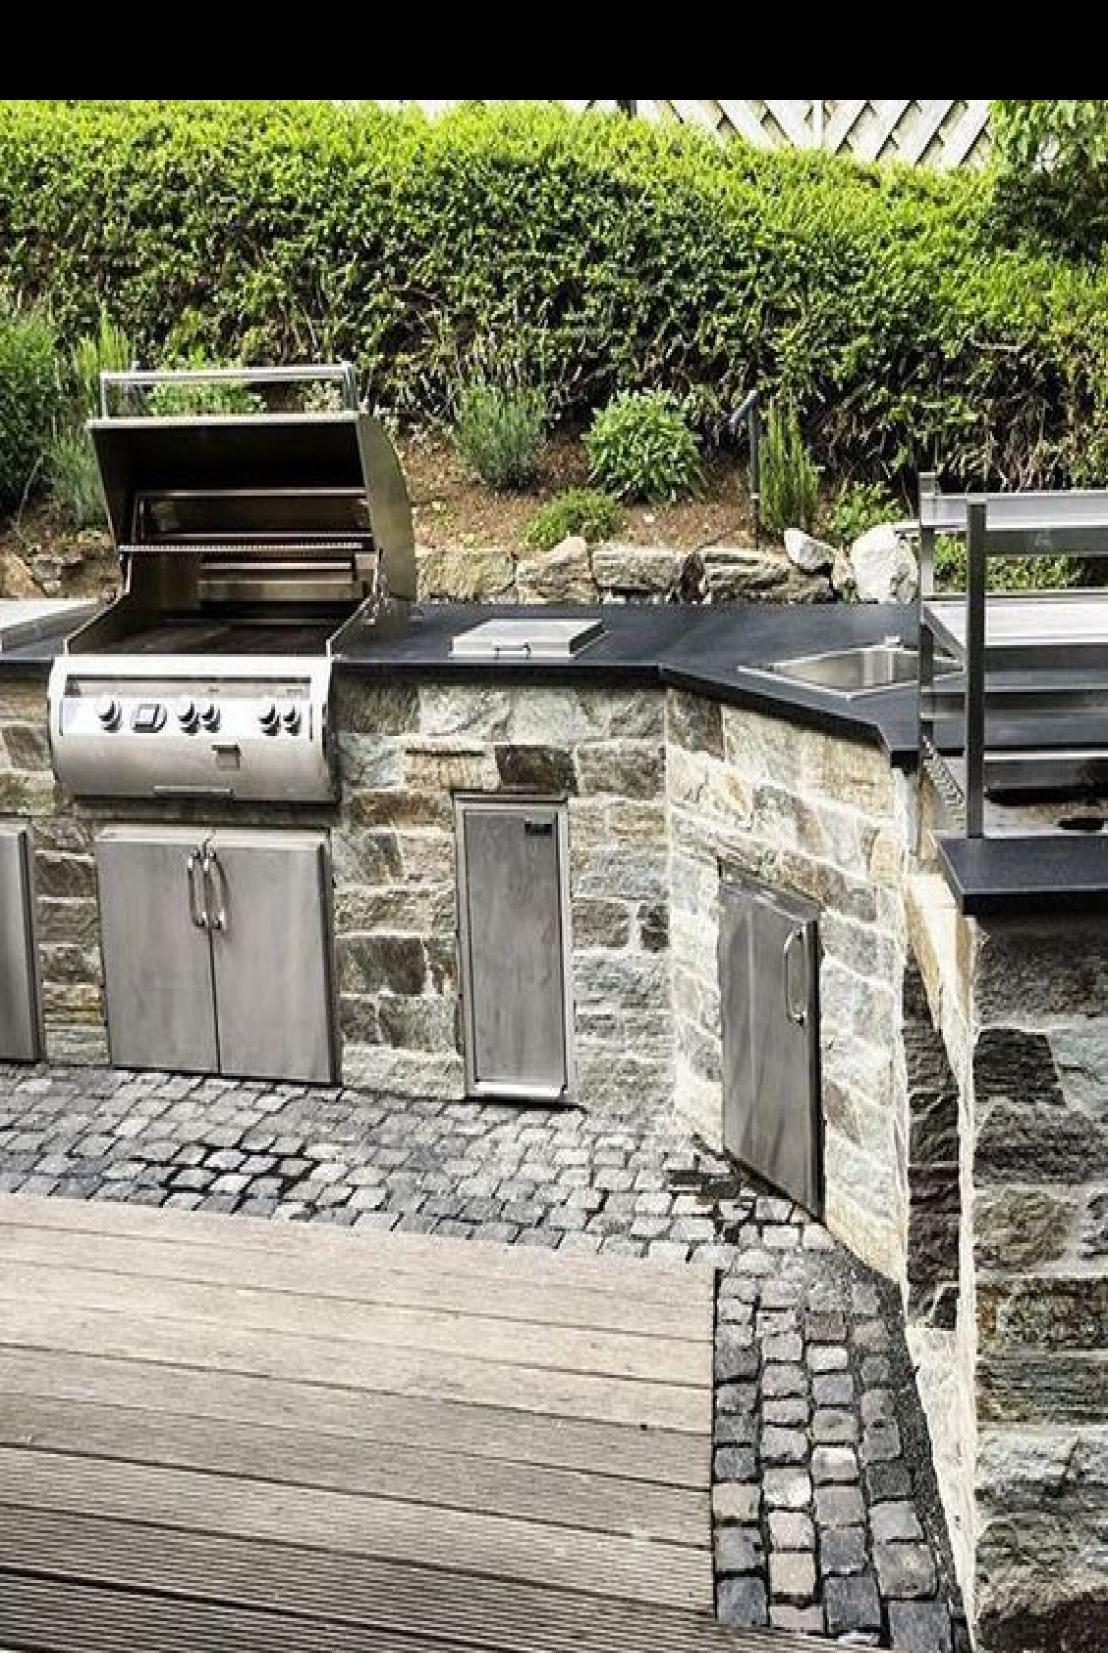 49 Inspiring French Country Garden Decor Ideas In 2020 French Country Garden Decor Outdoor Kitchen Patio Outdoor Kitchen